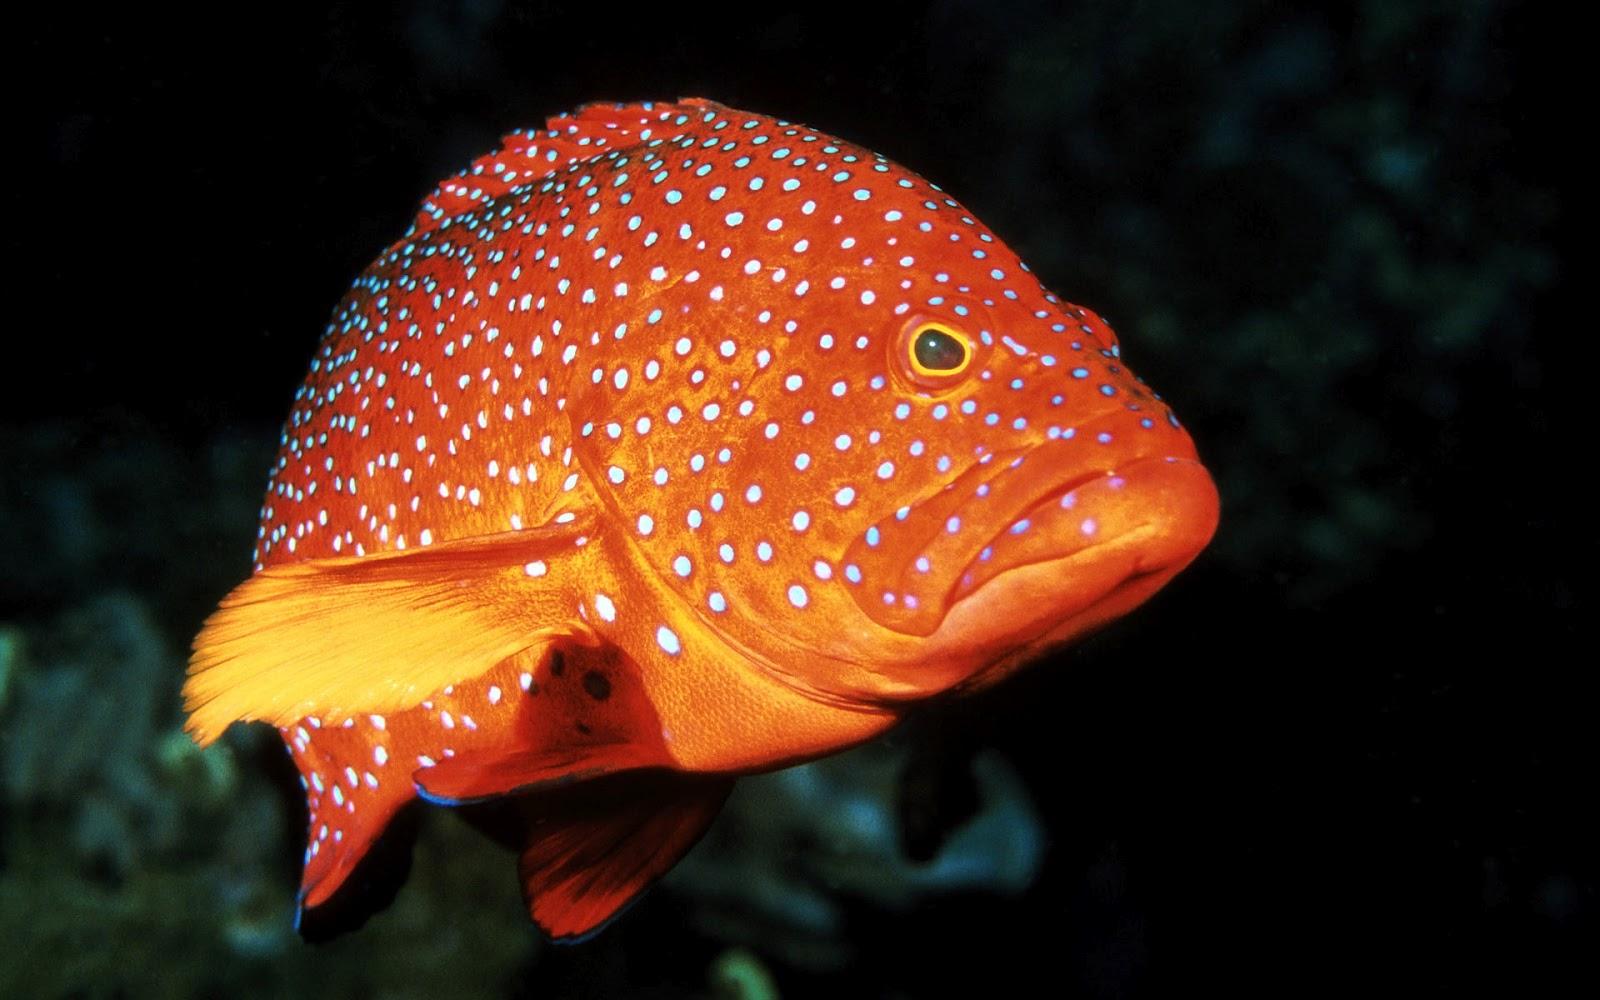 http://4.bp.blogspot.com/-GgENPVndQMo/UBAe4_xIULI/AAAAAAAAARA/5Y2h_WdxOuw/s1600/Ocean-life-wallpapers-marine-life-on-the-seabed-like-fish-plants-animals-hd-wallpaper-30.jpg